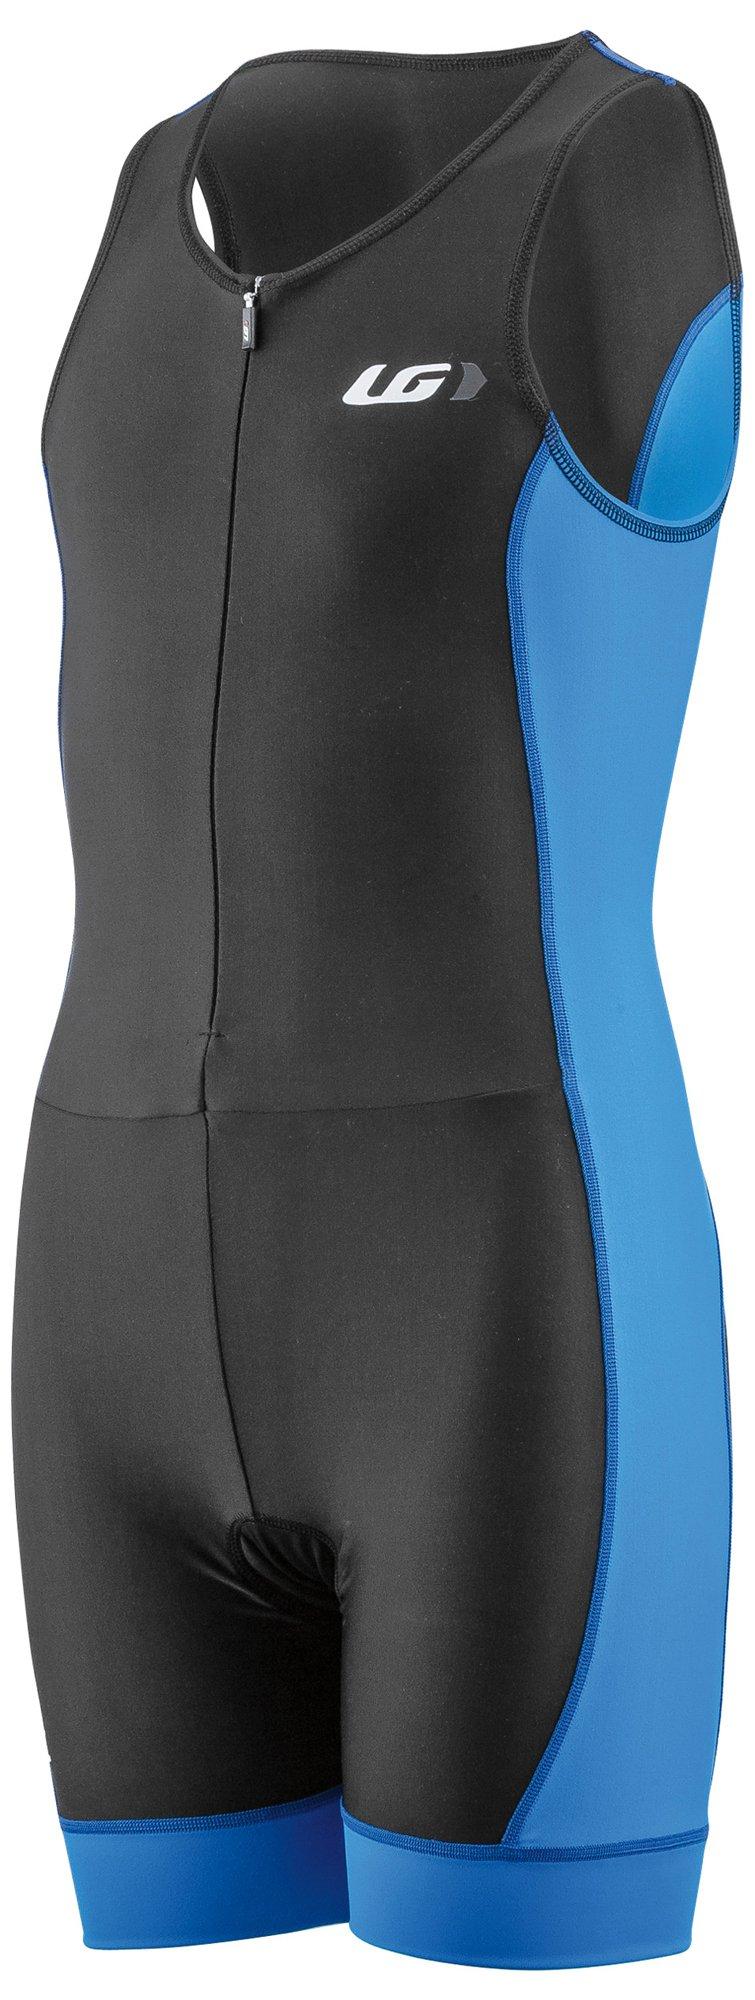 Louis Garneau Kids Comp 2 Sleeveless, Padded Triathlon Cycling Suit, Curacao Blue, Junior X-Small